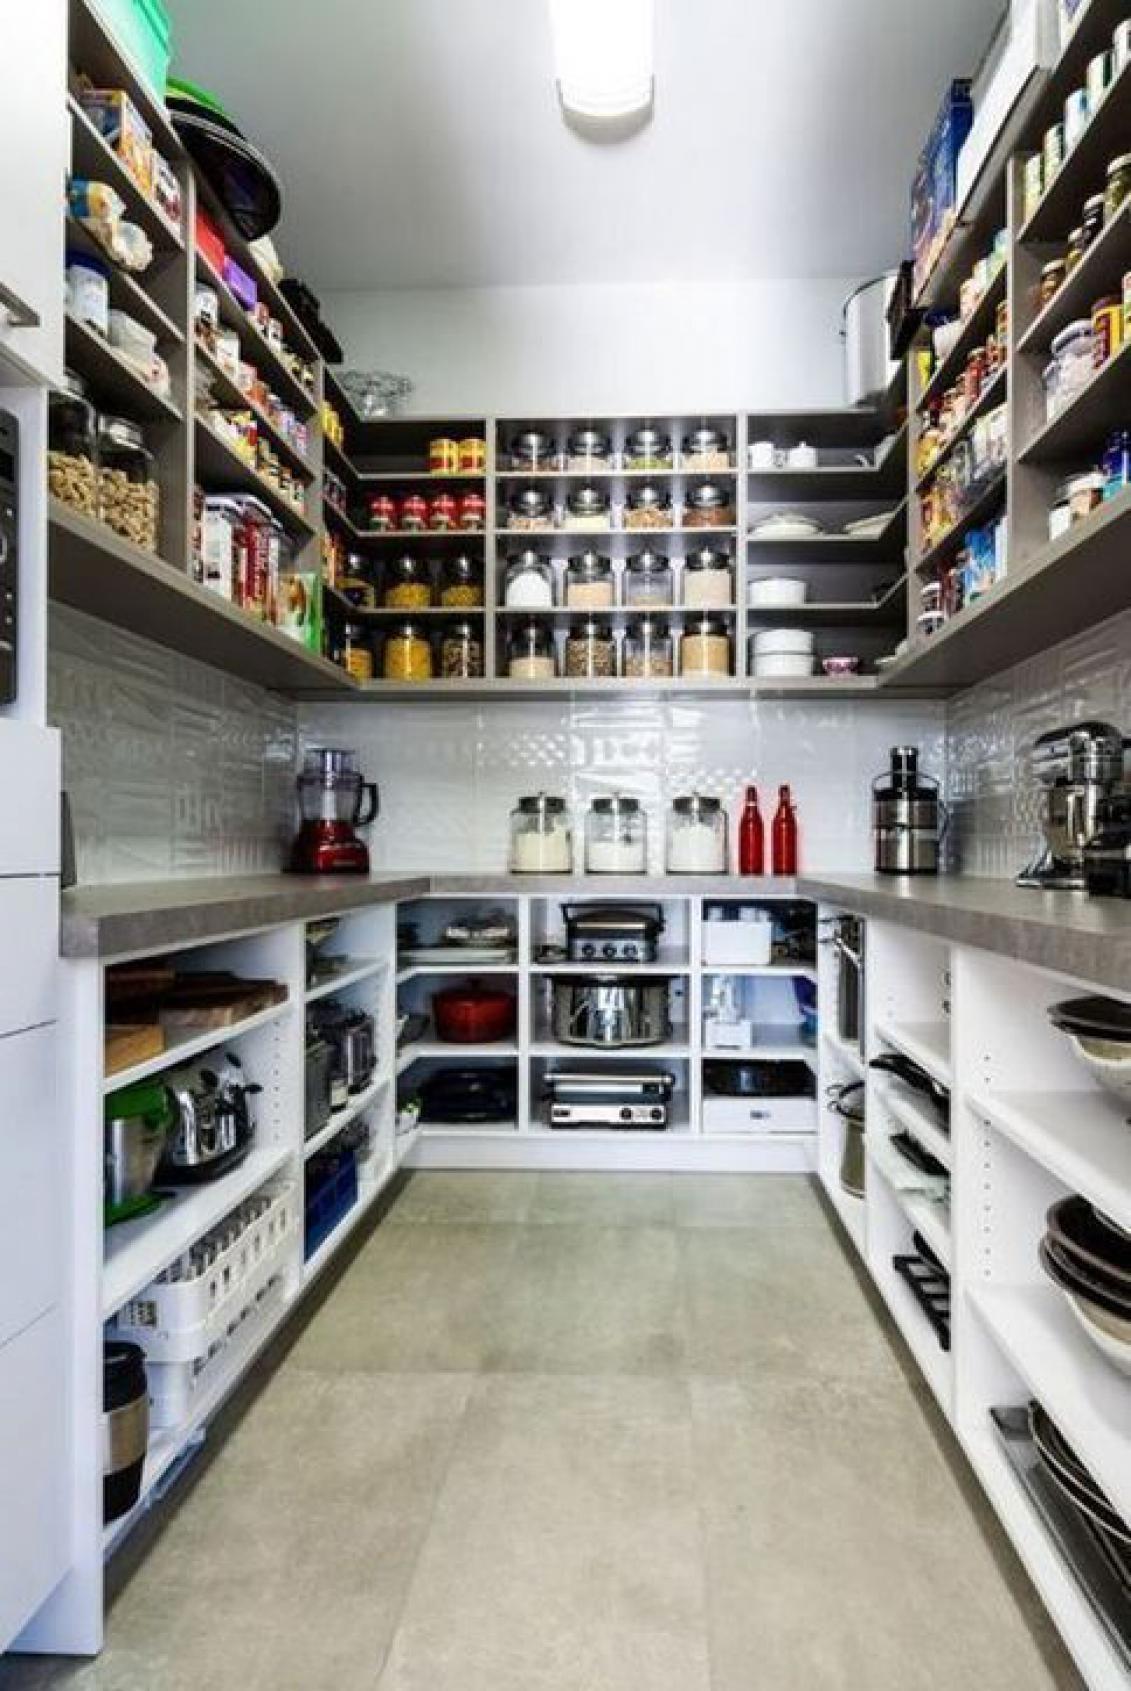 49 Romantic Rustic Farmhouse Bathroom Remodel Ideas Kitchen Pantry Design Pantry Design Pantry Layout